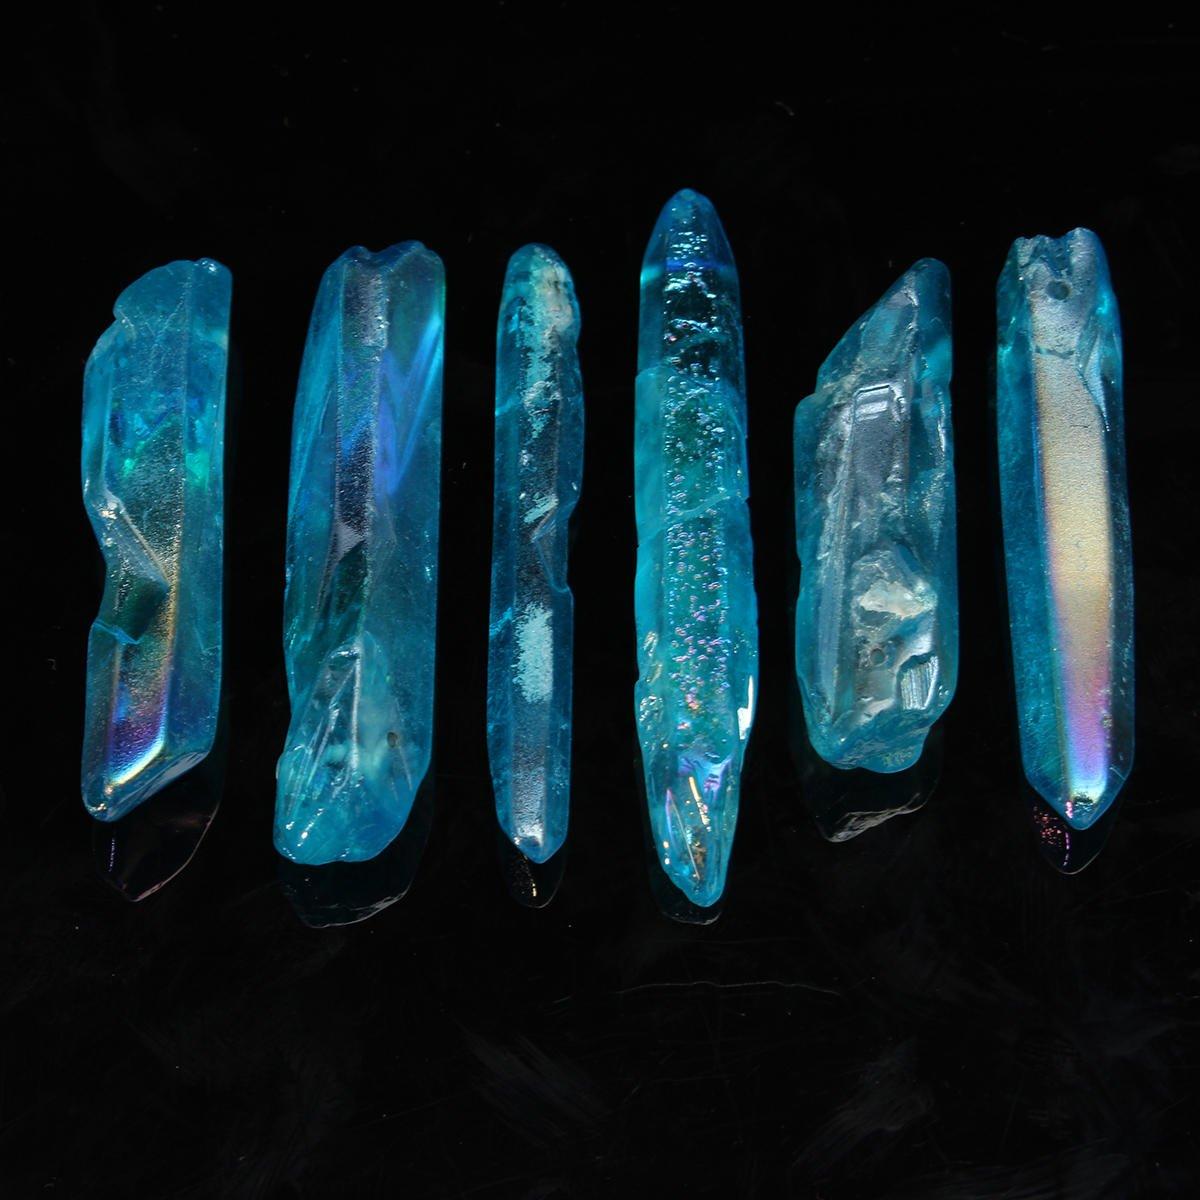 Clear Quartz Crystal - Aura Quartz Crystal - 50G VERY POWERFUL & RARE BLUE LEMURIAN SEED QUARTZ CRYSTAL HEALING POINT ( Blue Quartz Crystal )